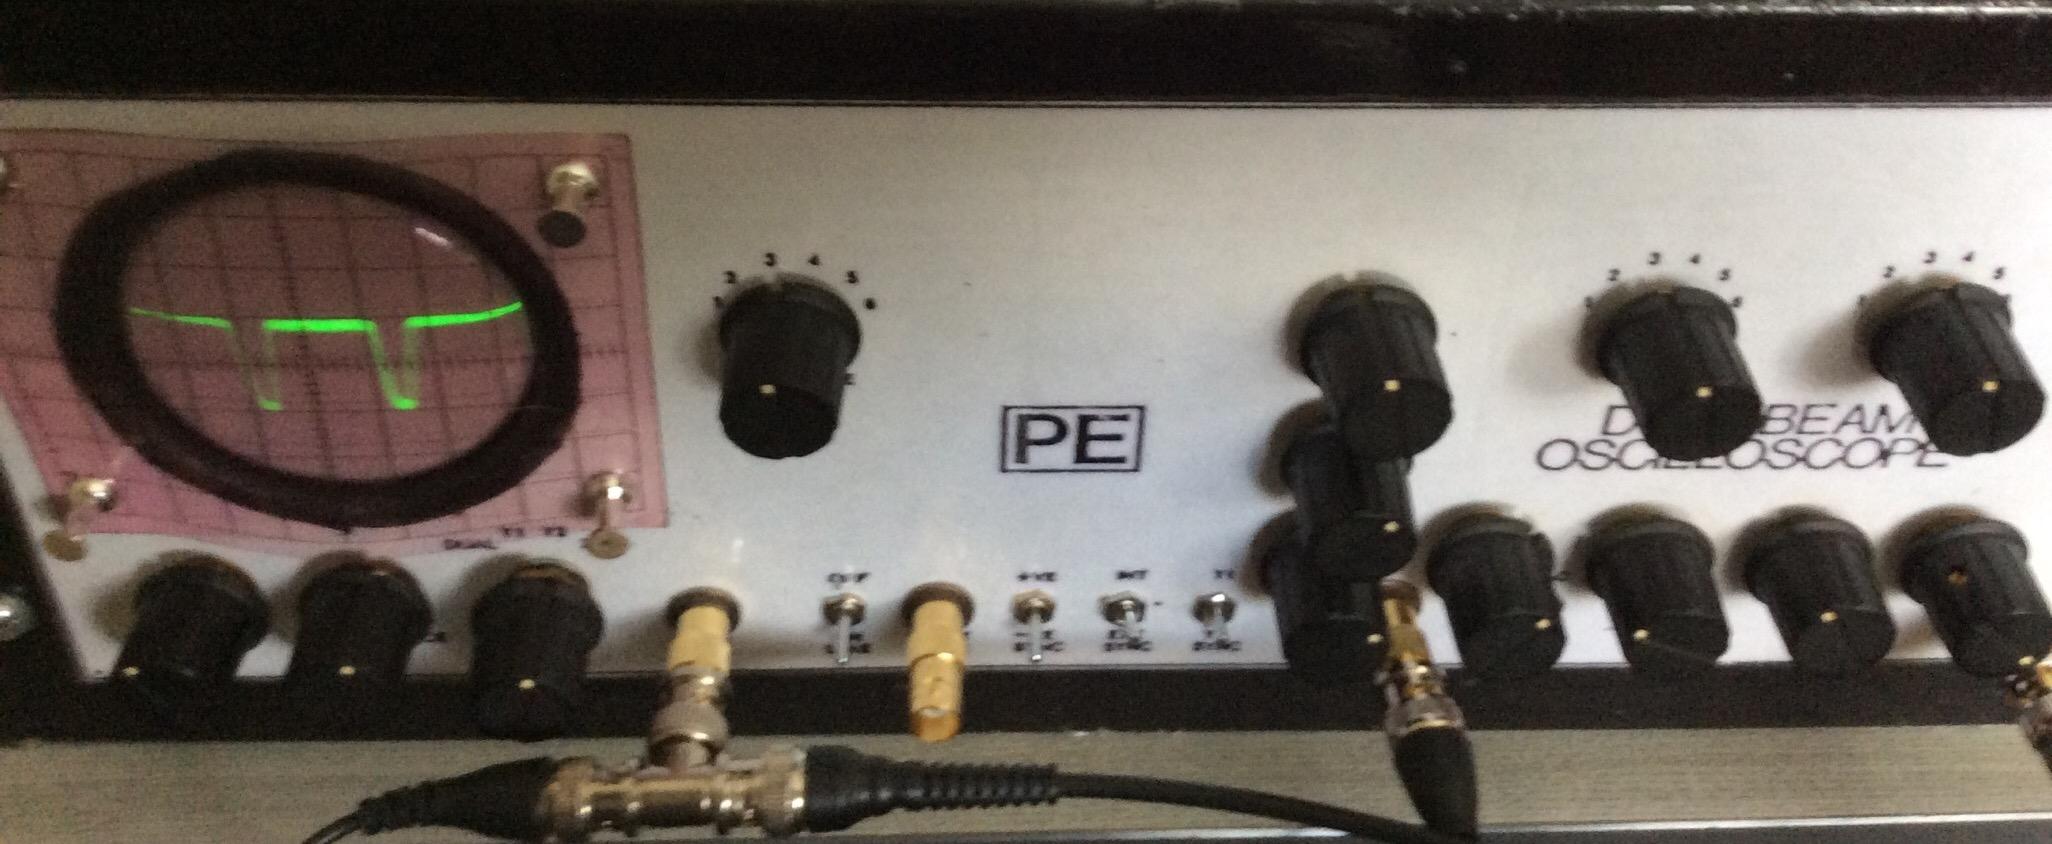 Dual Beam Oscilloscope project